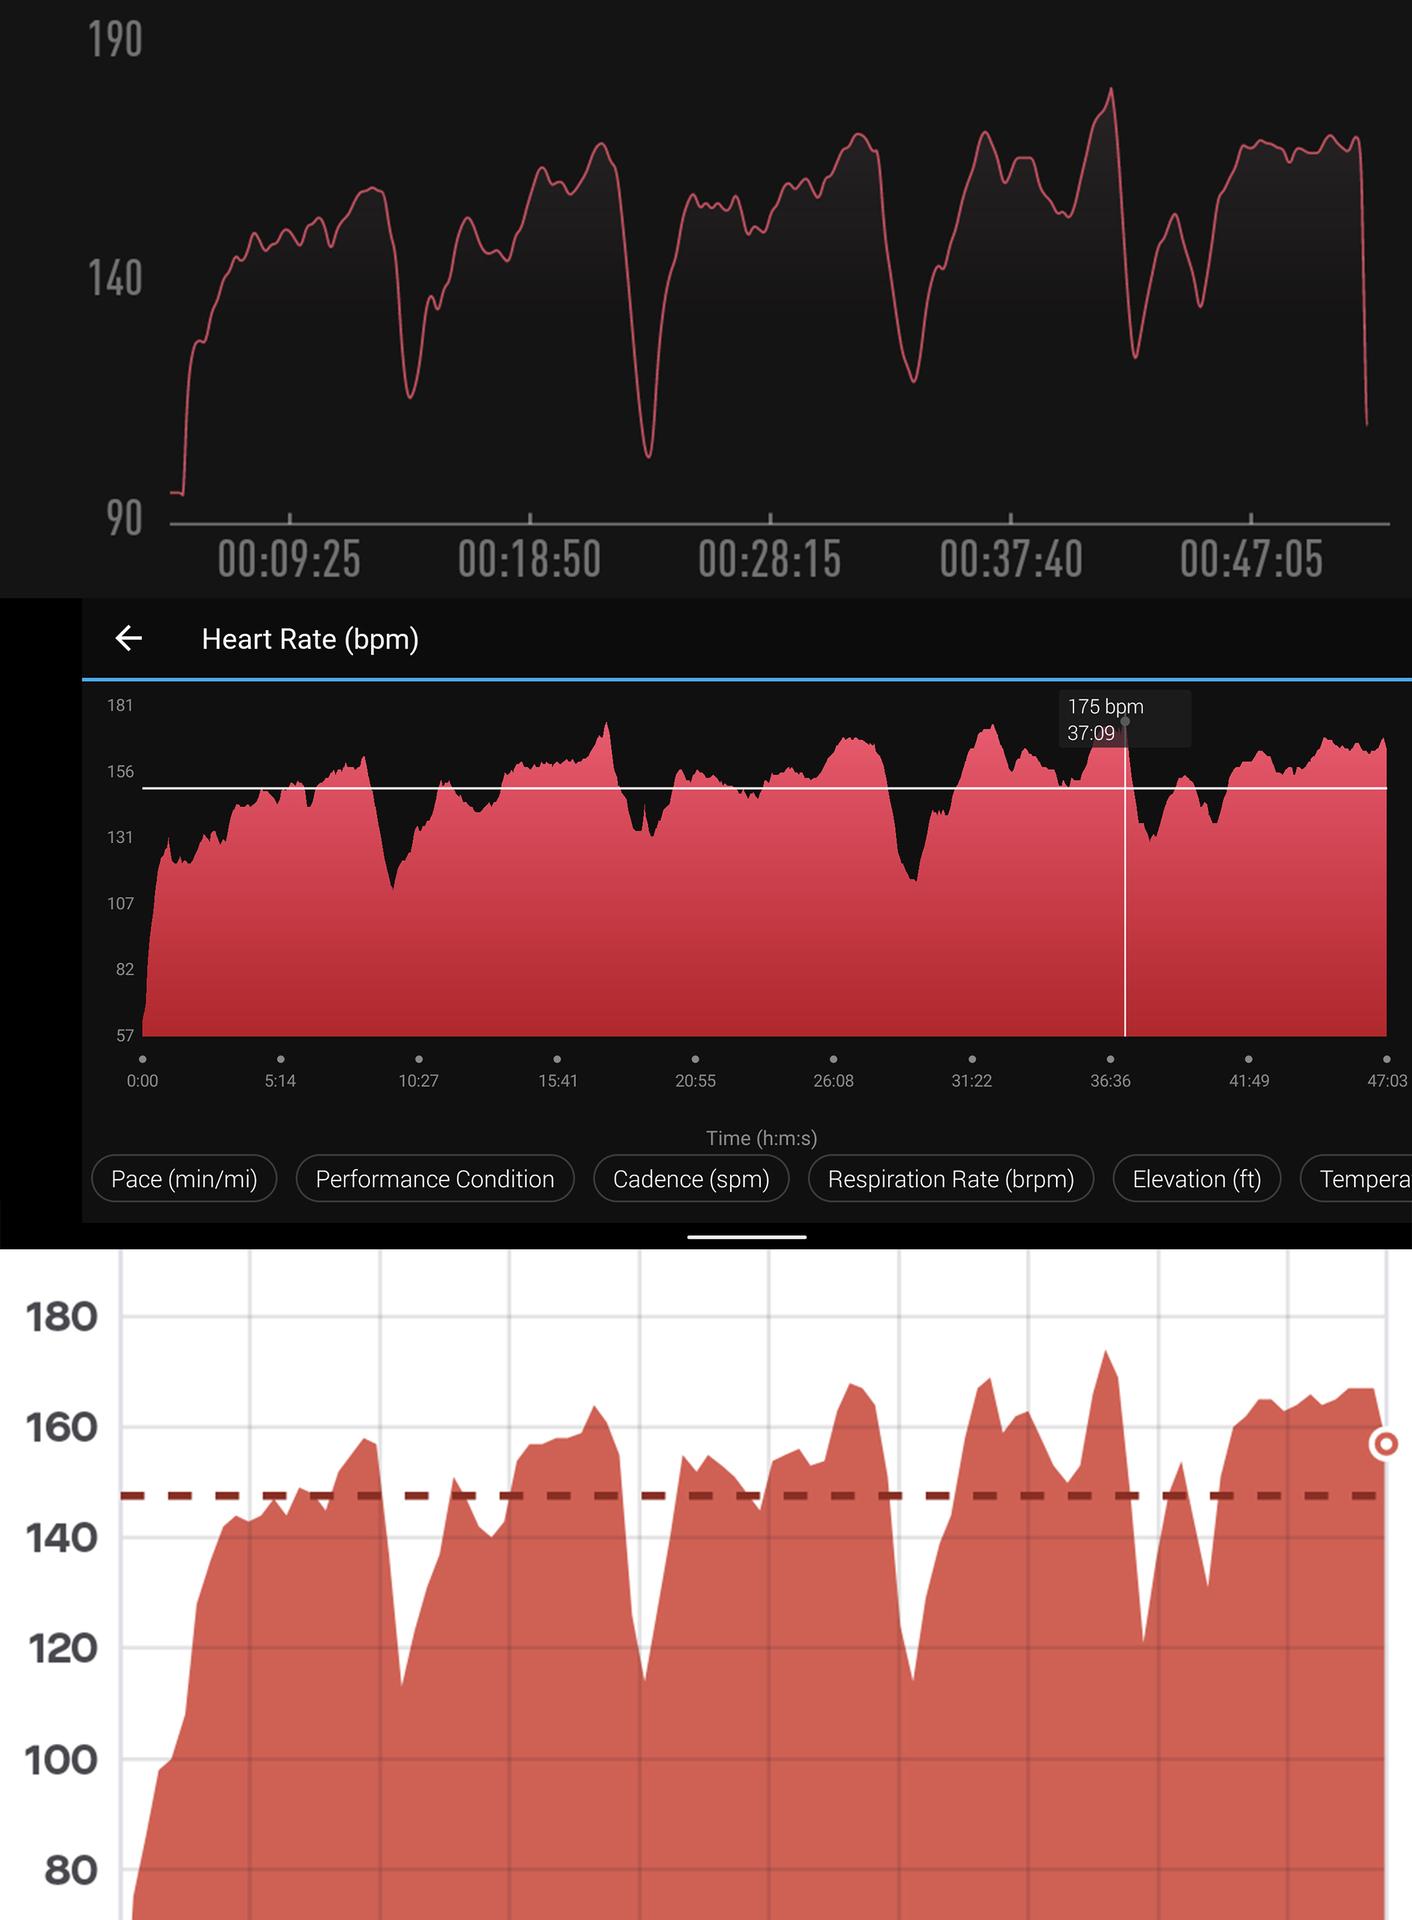 xiaomi mi band 5 review heart rate data vs garmin fenix 6 pro